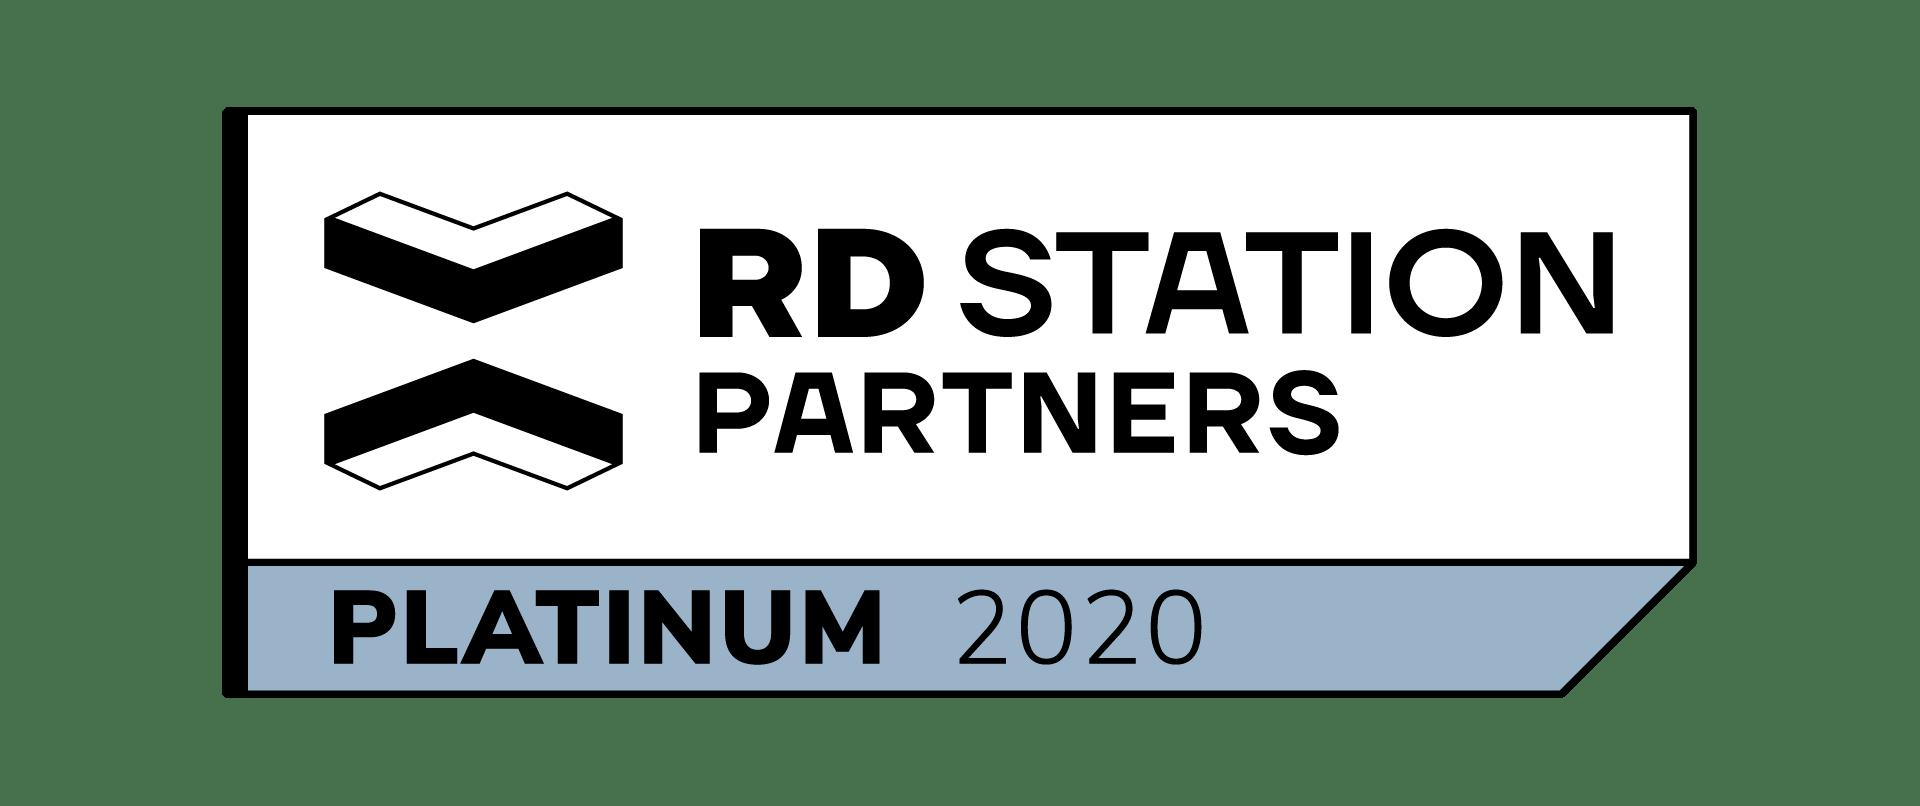 selo_platinum_rd-station-partners_2020